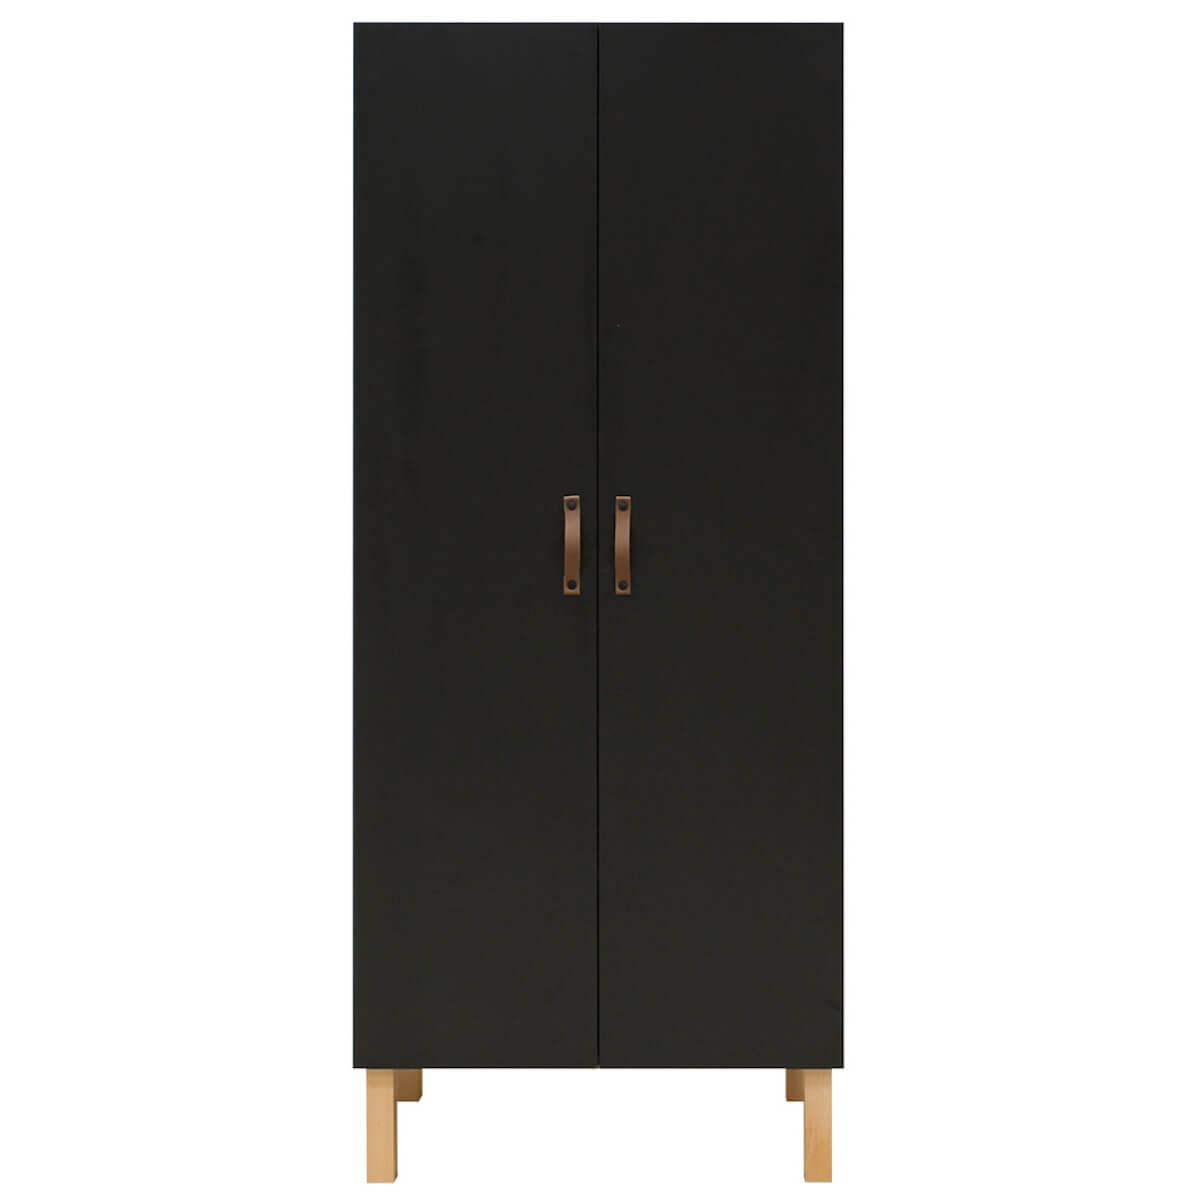 Kleiderschrank 2 Türen FLORIS Bopita Schwarz Mat-Natur